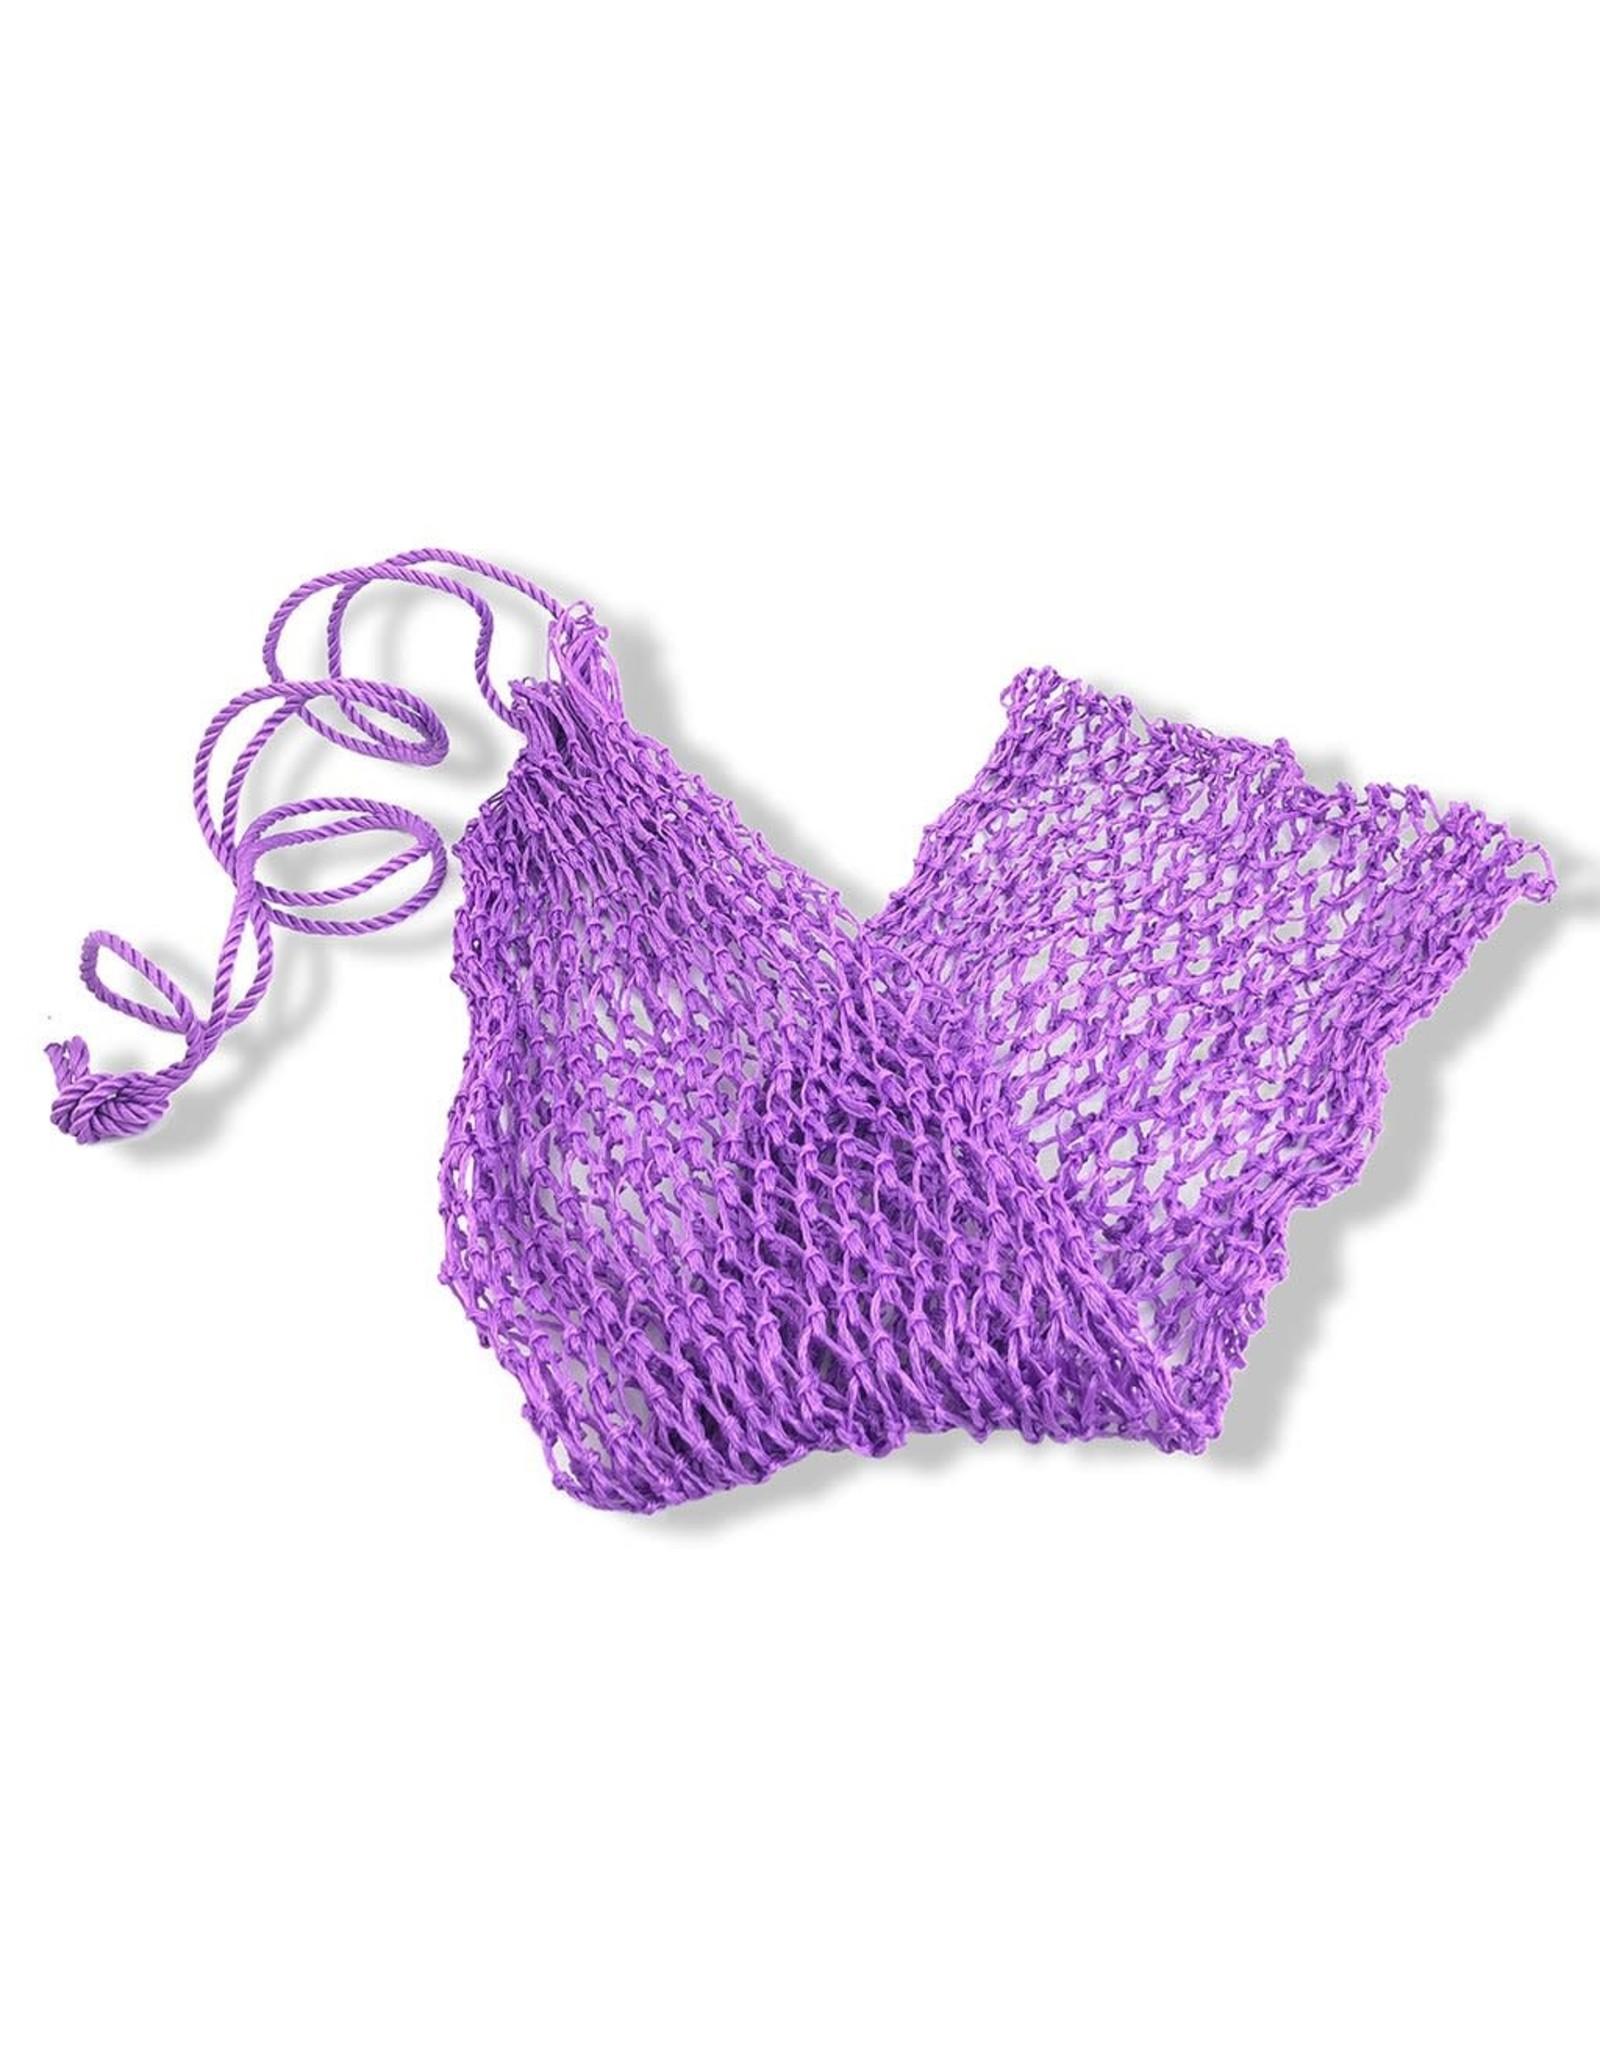 Copy of Slow Feed Hay Net (small Holes) purple